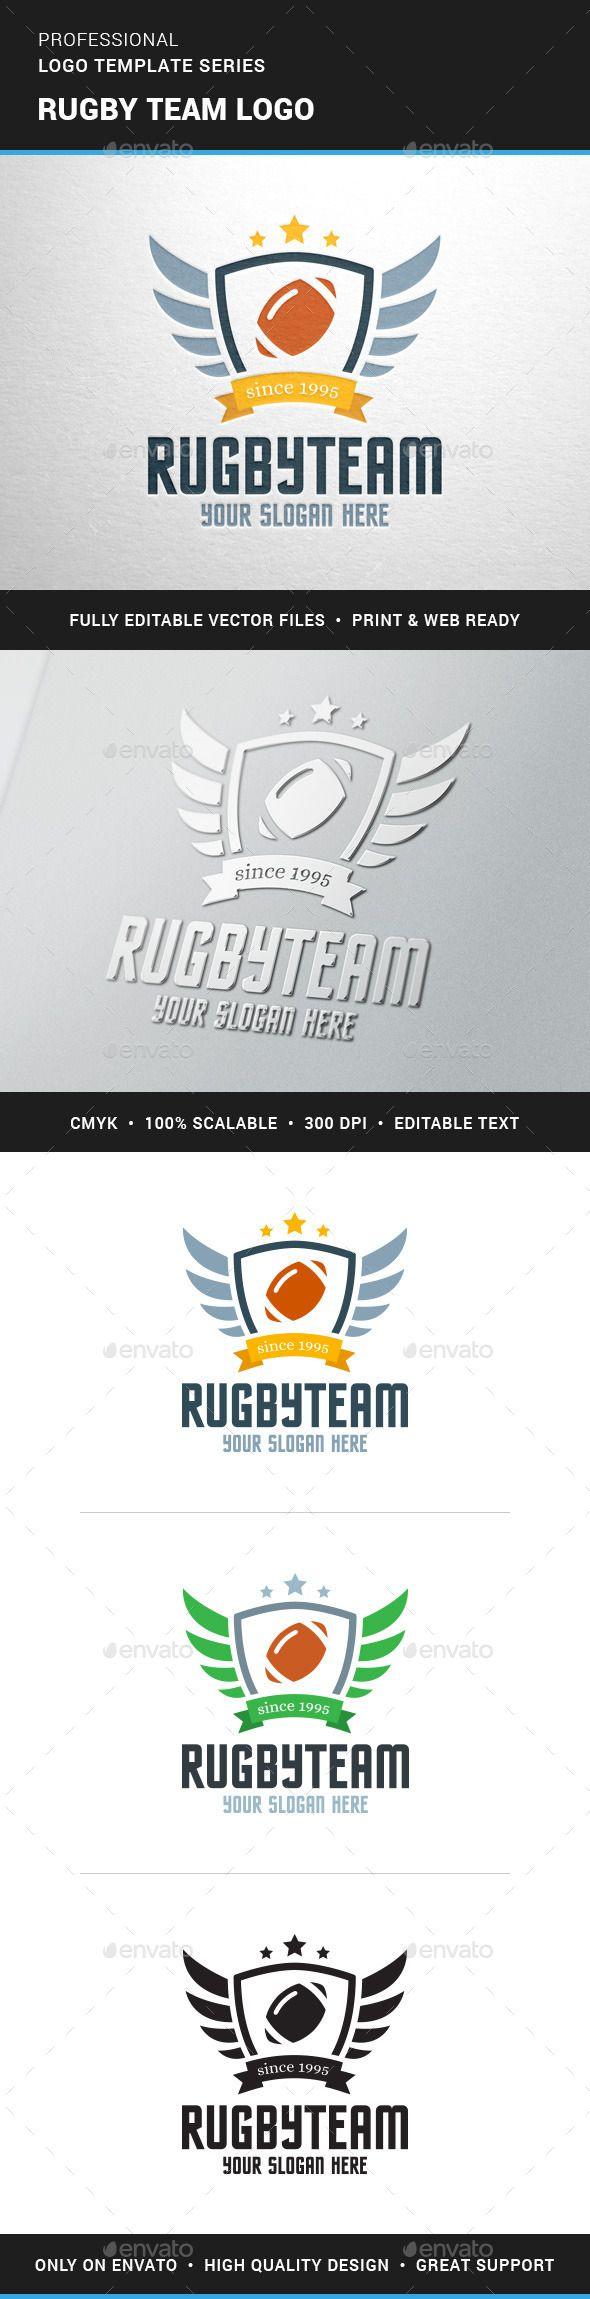 Rugby Team Logo Team Create Logo Design Team Logo Rugby Team